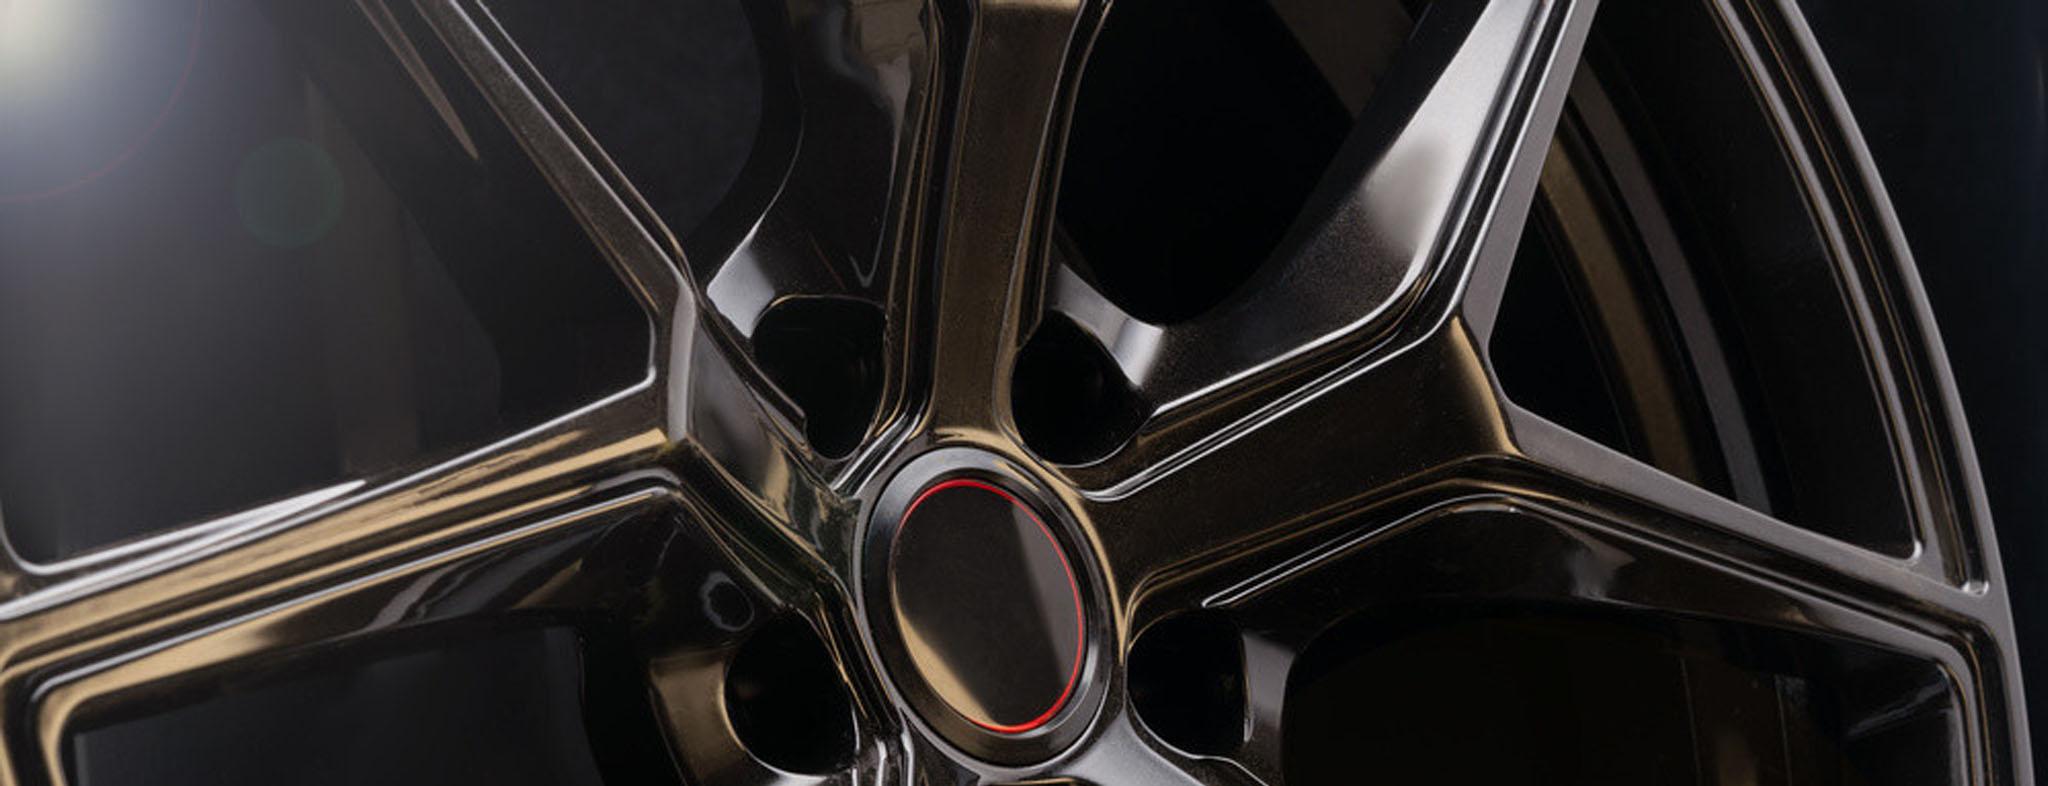 buy forged wheels australia